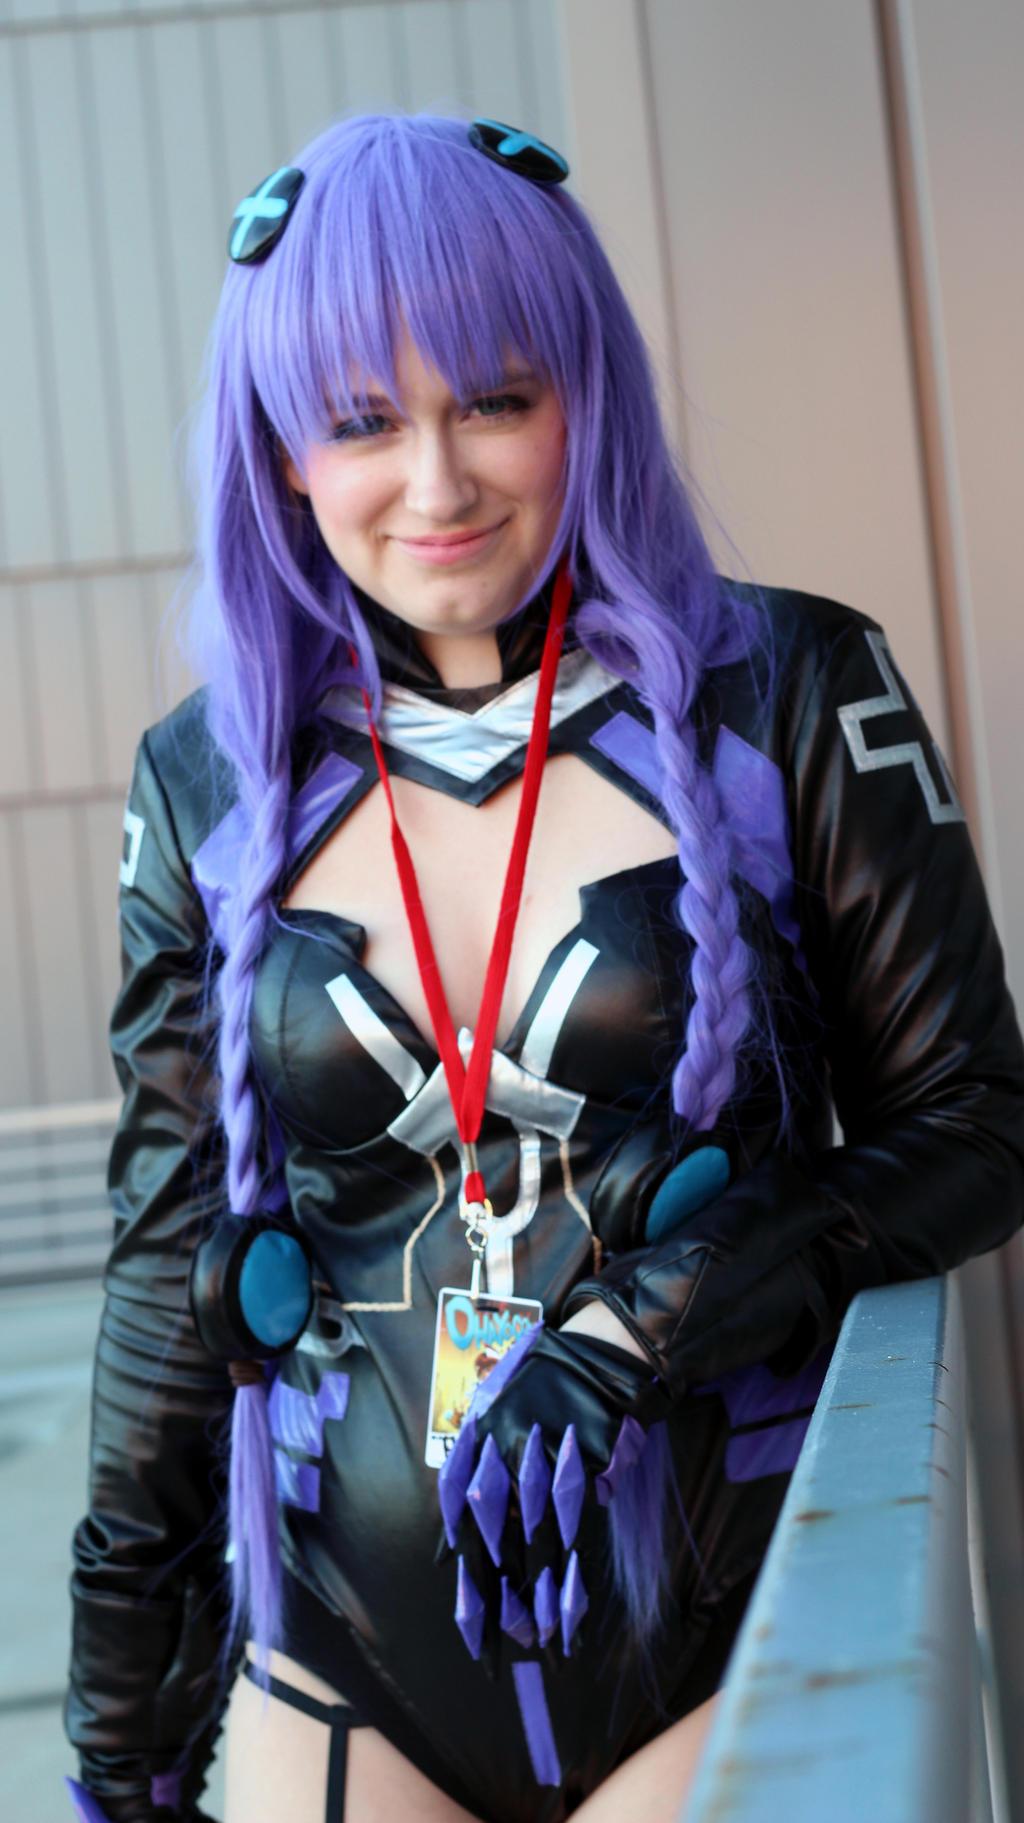 Neptune's Smile by geekypandaphotobox